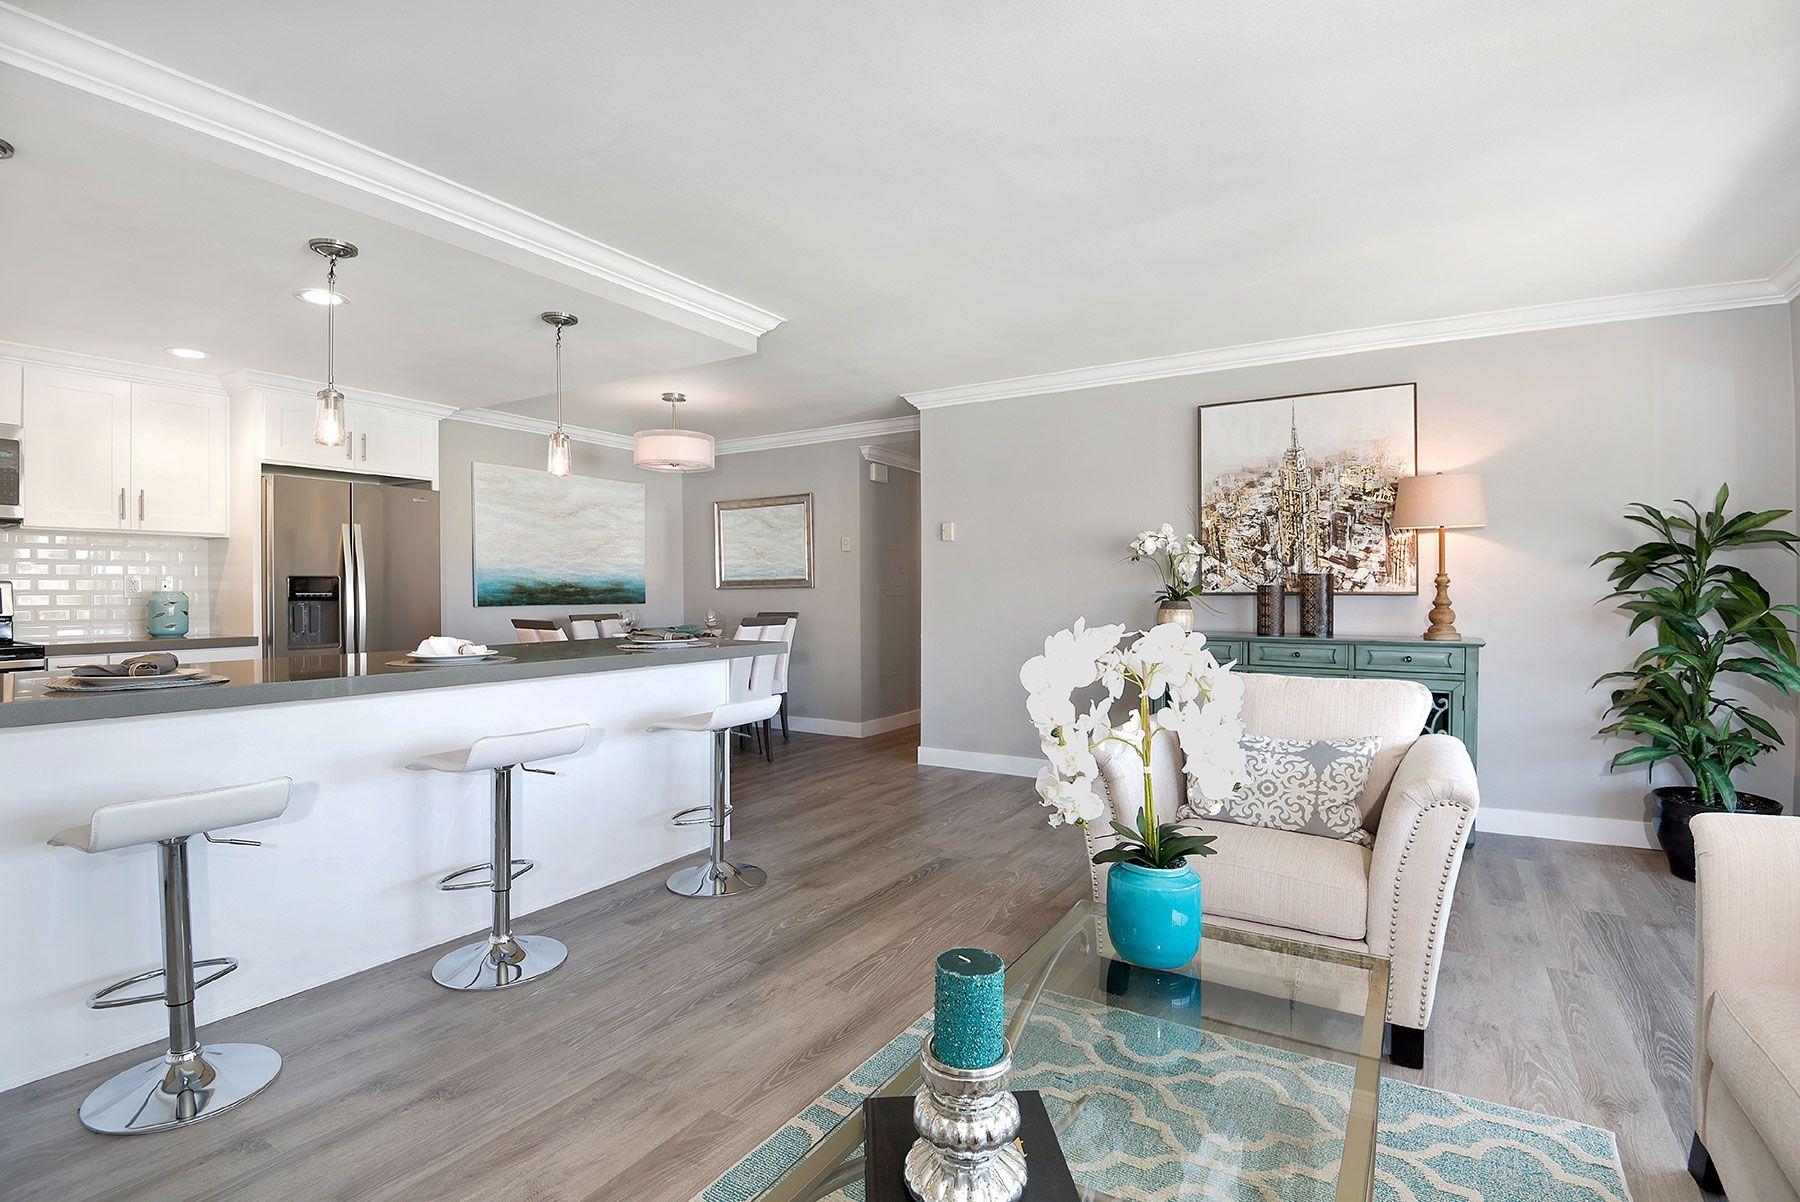 2279 Via Mariposa W #N For Sale - Laguna Woods, CA | Trulia